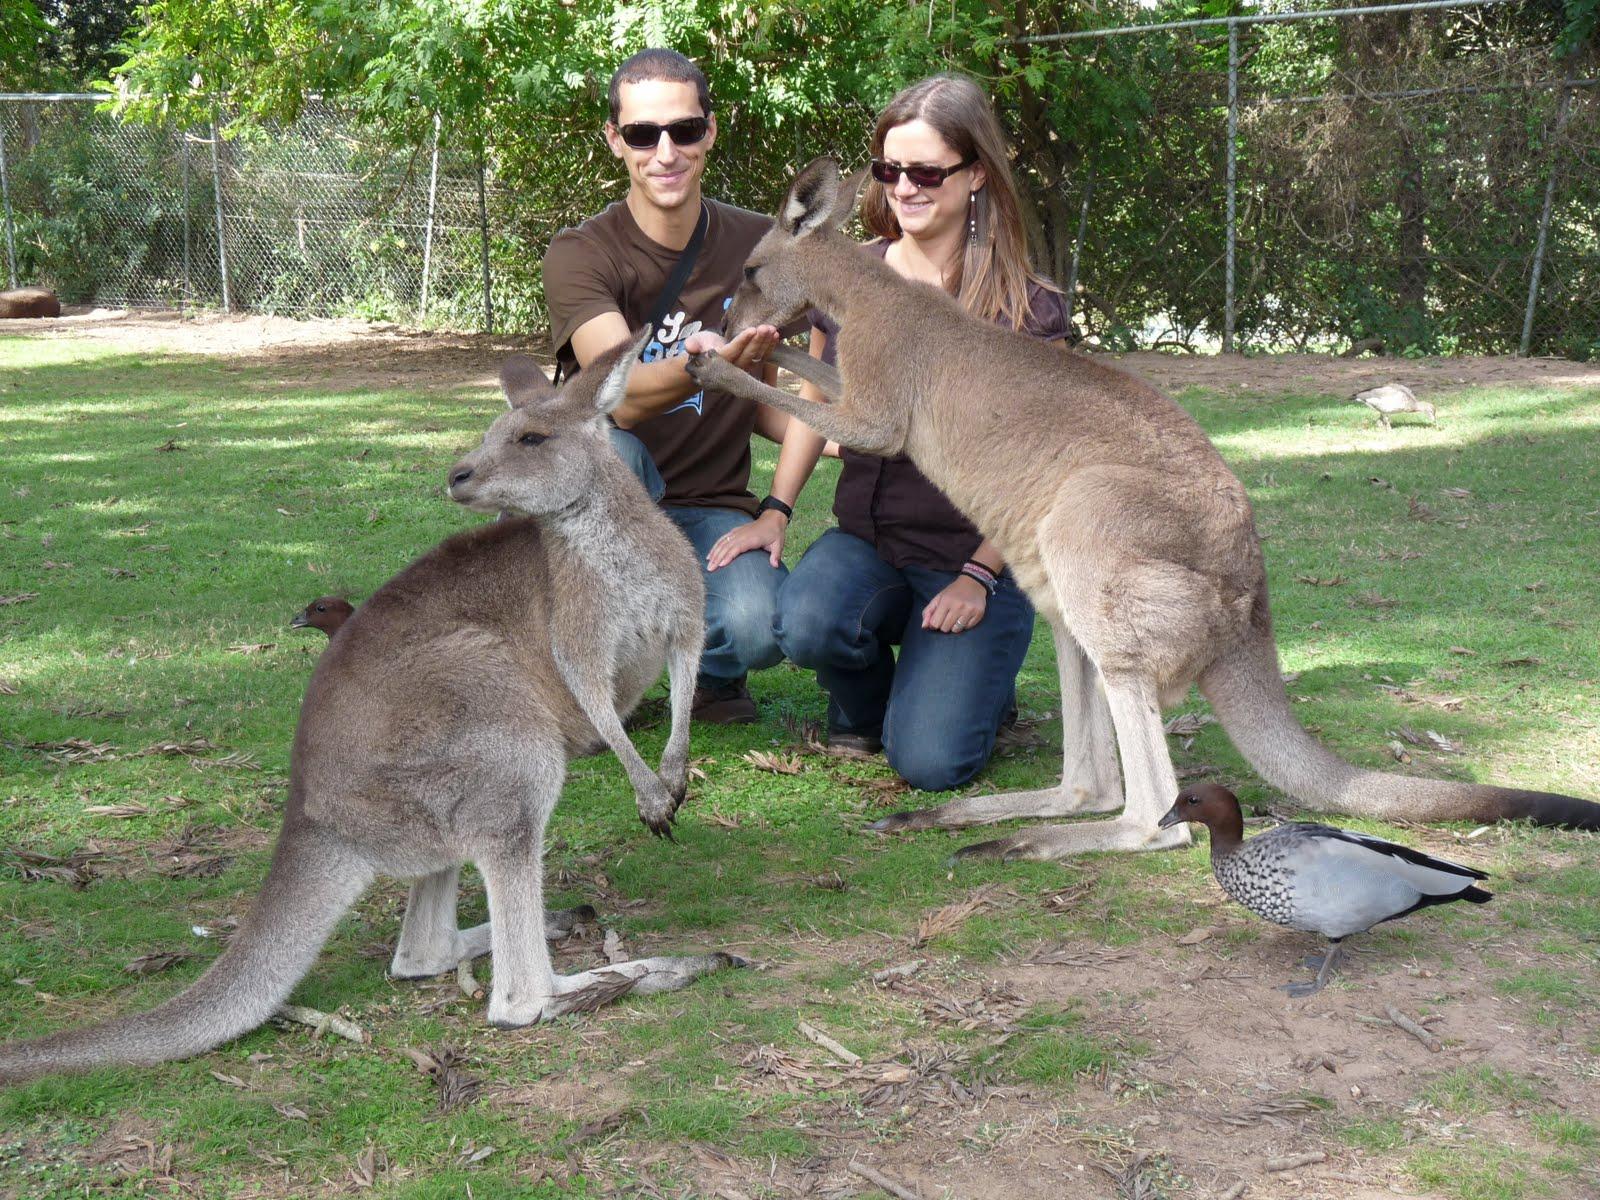 Sidney, Australia, vuelta al mundo, round the world, La Aventura de Pablo y Elena